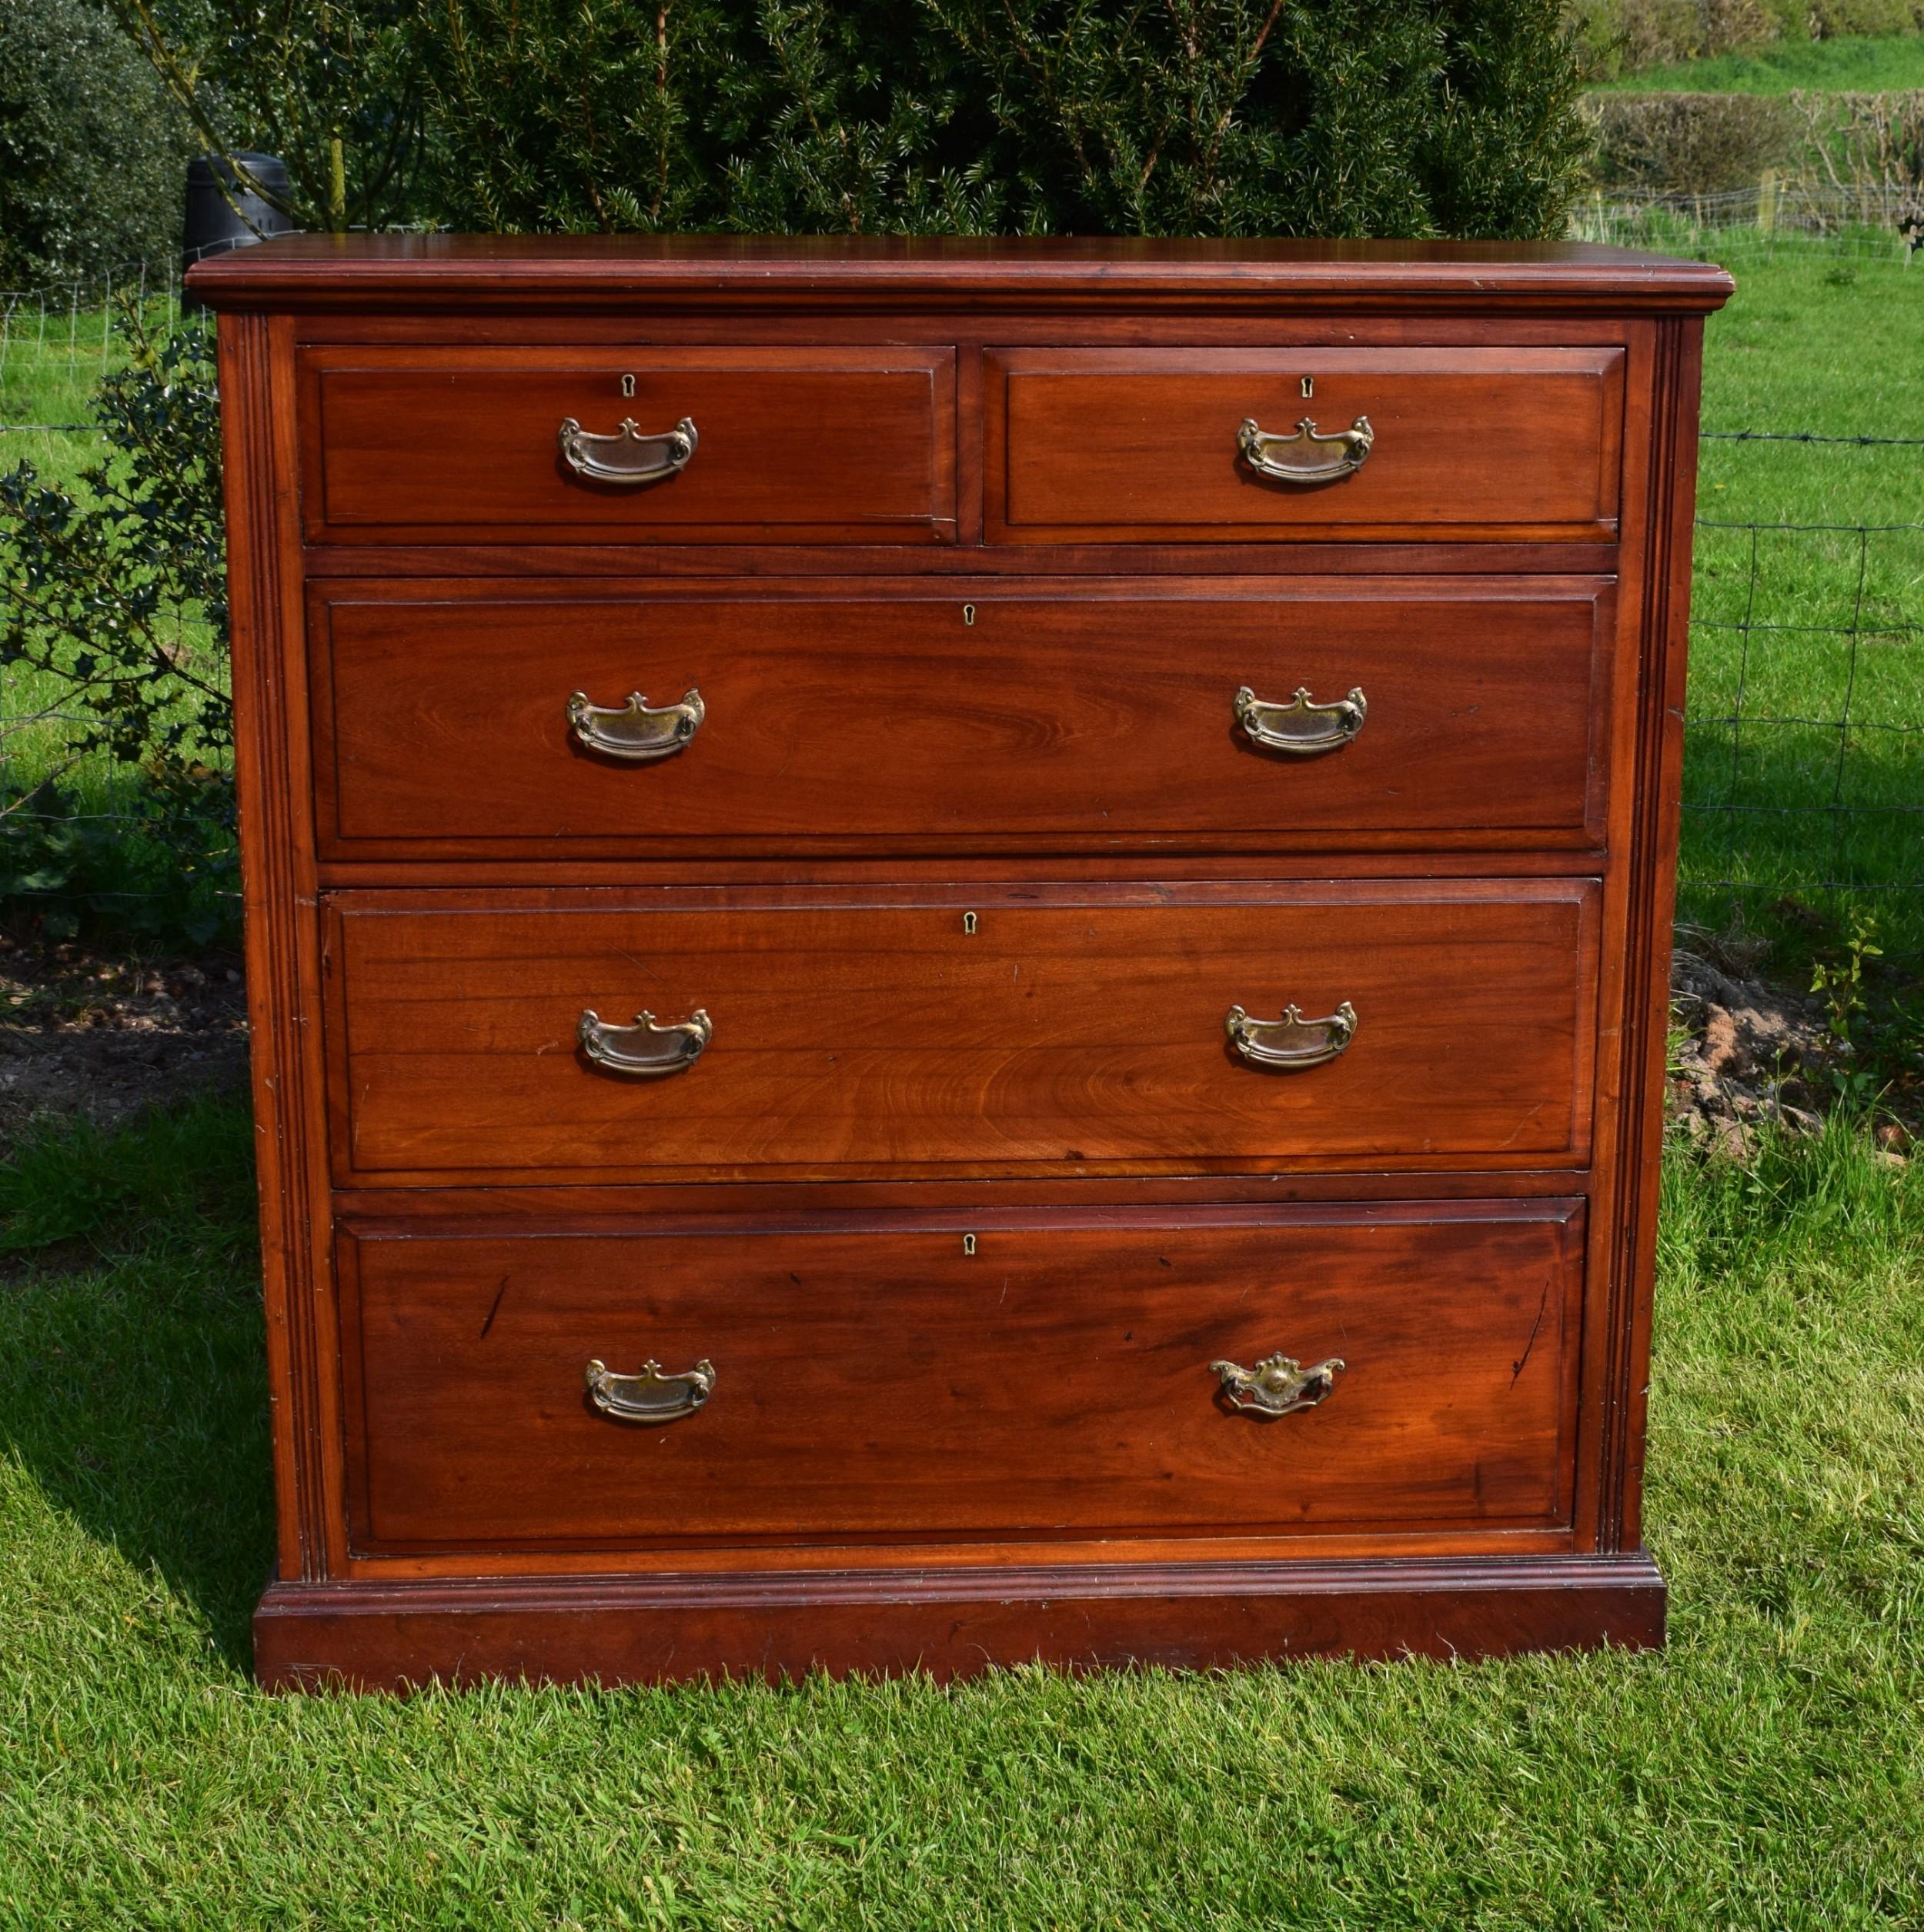 edwardian mahogany chest of drawer's